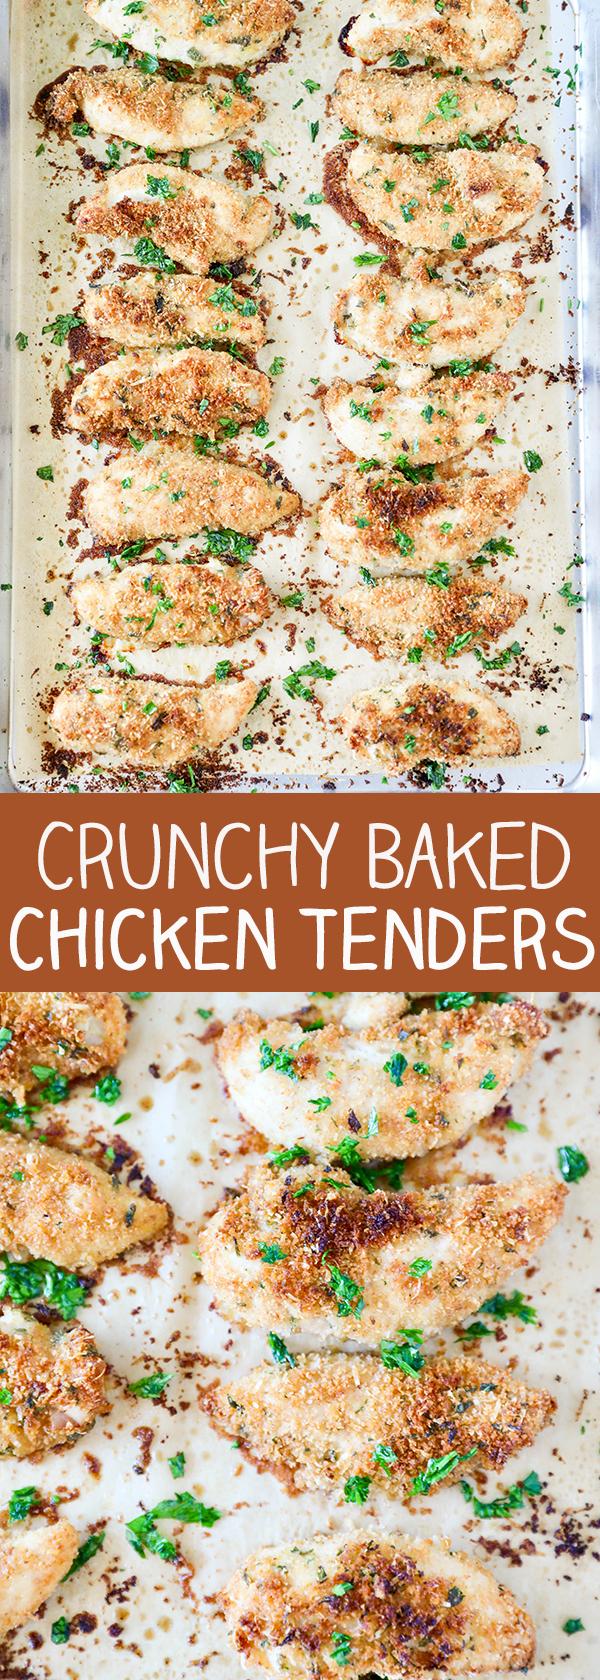 Crunchy Baked Chicken Tenders